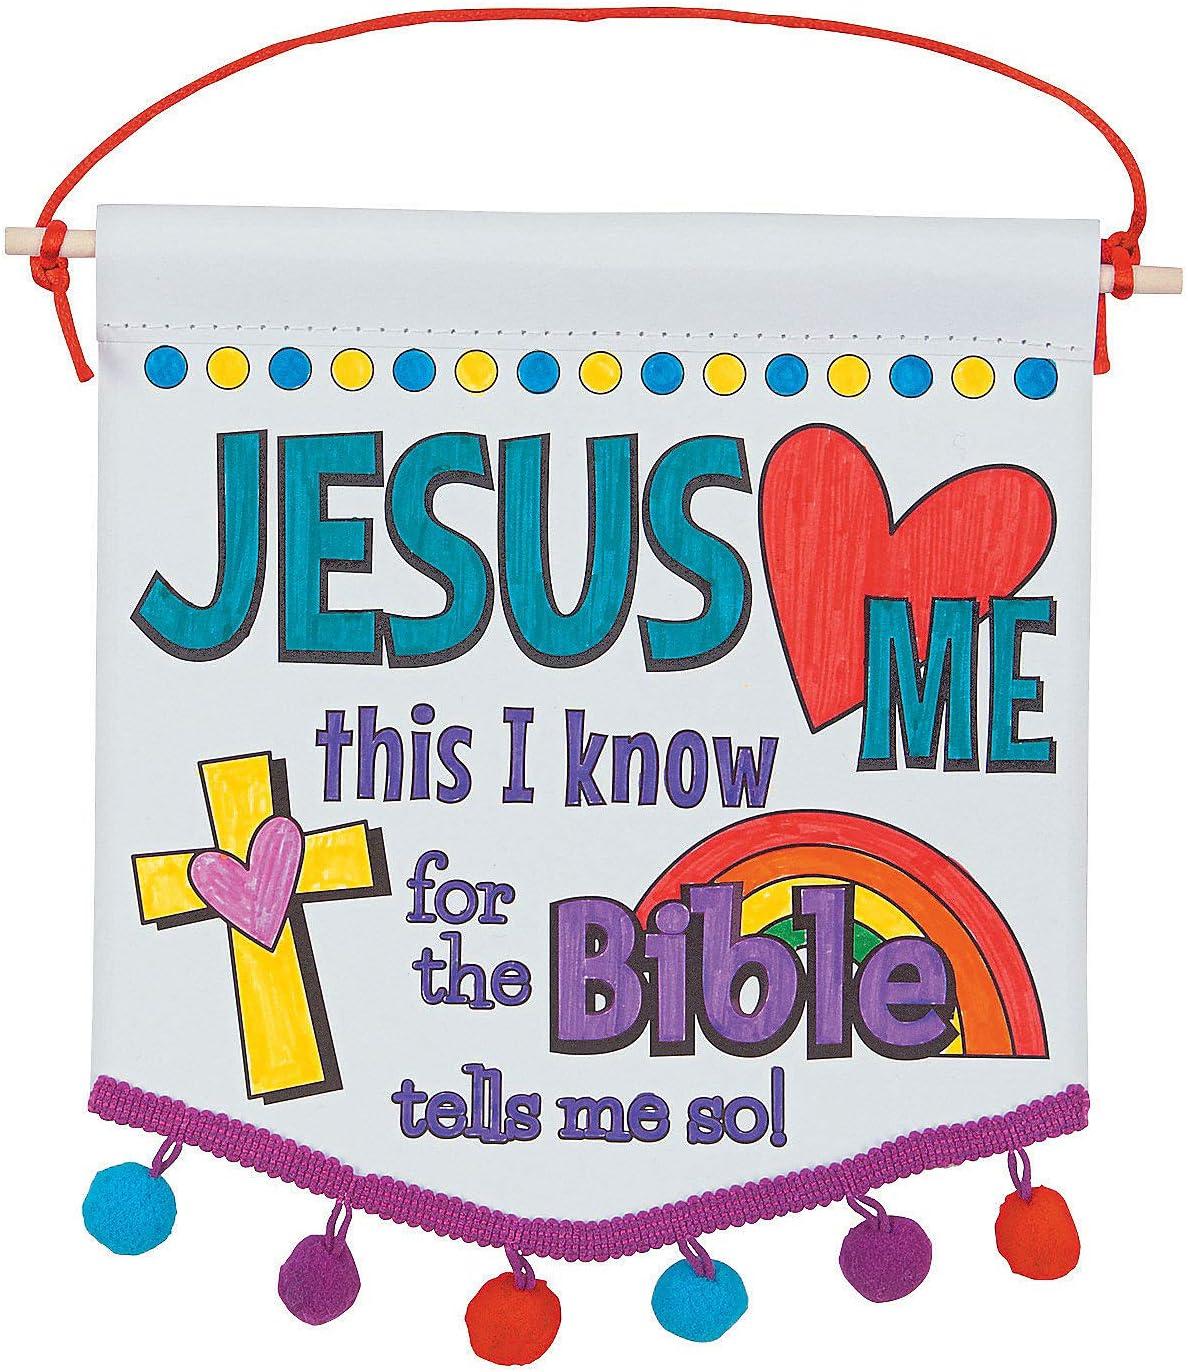 38 Pastel Jesus Loves Me Print Grosgrain Ribbon Sunday School Easter Bows Church He is Risen Rainbow Bible Study Holy Cross